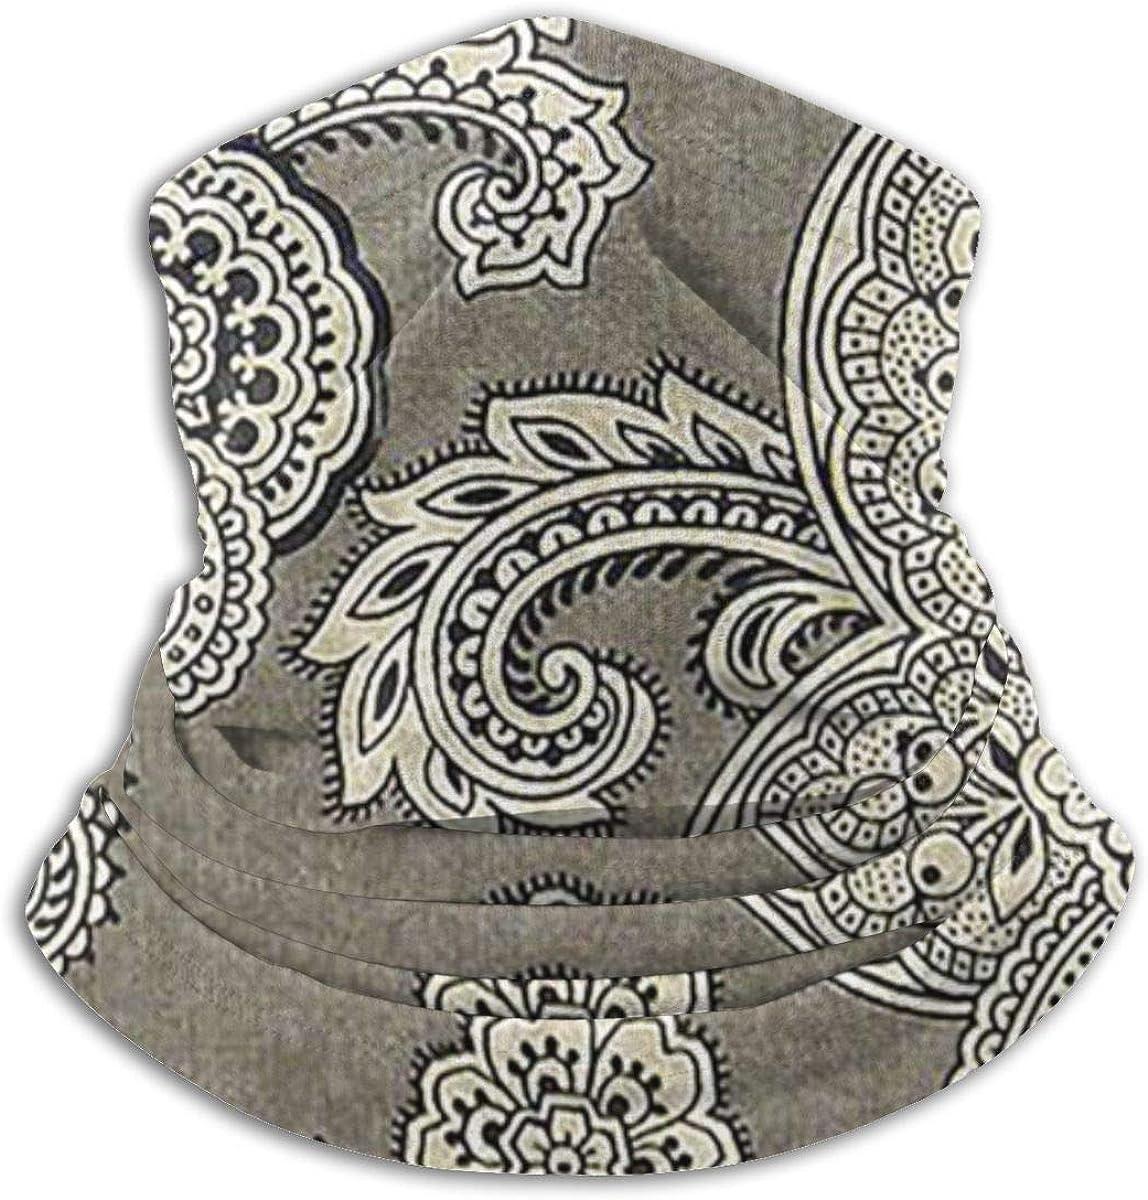 Paisley Pattern Black Multi-function Neck Warmer Gaiter Polyester Neck Warmer Windproof Winter Neck Gaiter Cold Weather Scarf For Men Women